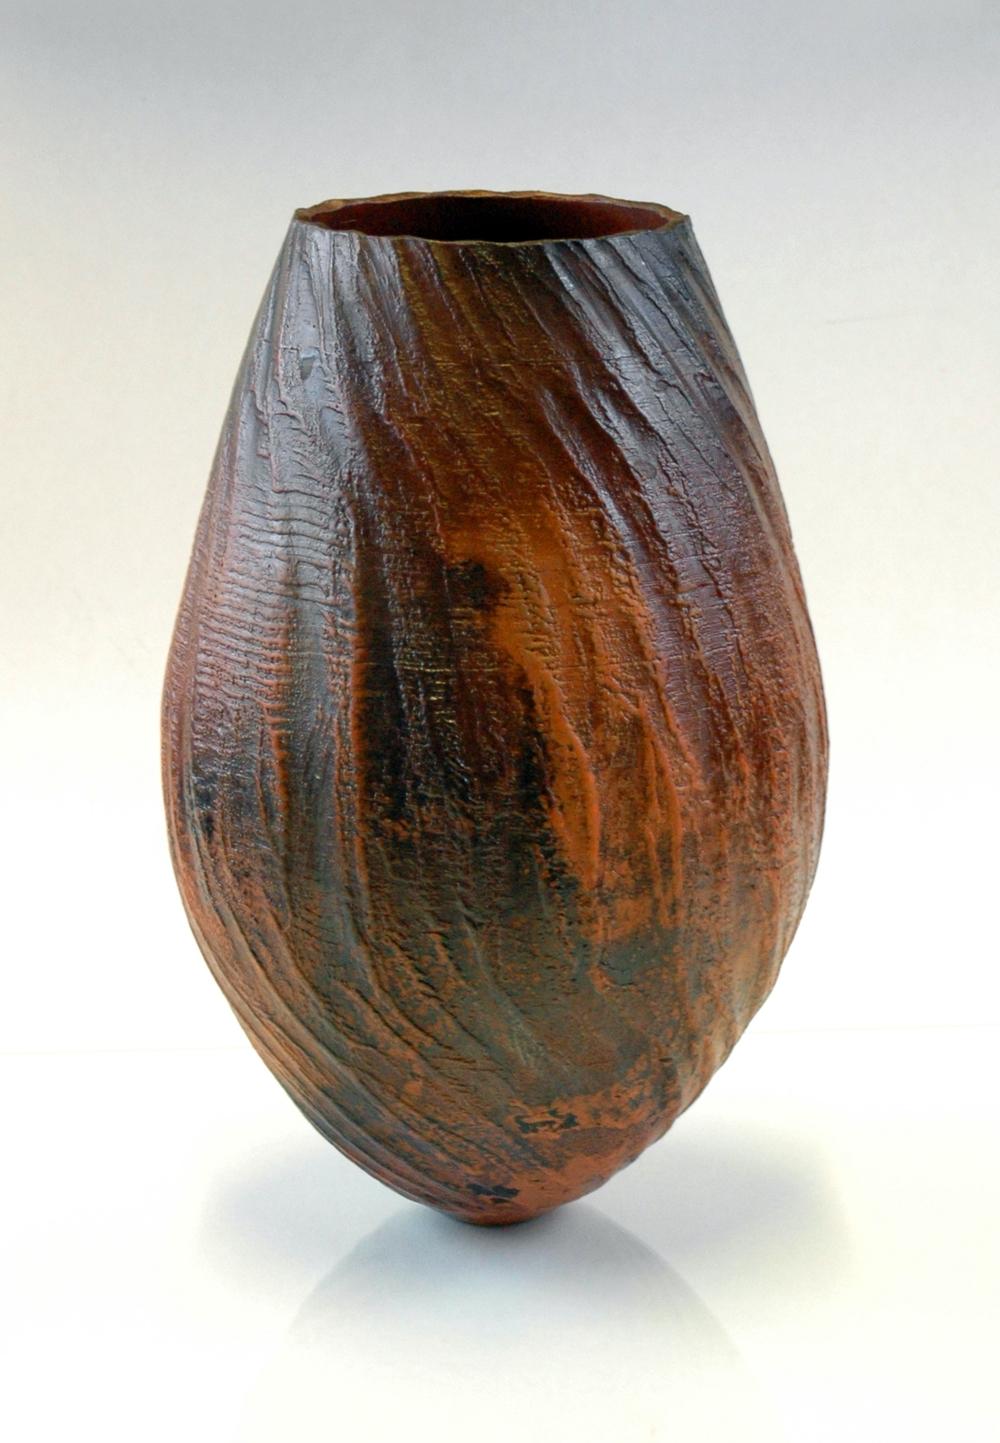 Juddered Terra Sigillata Form 2008